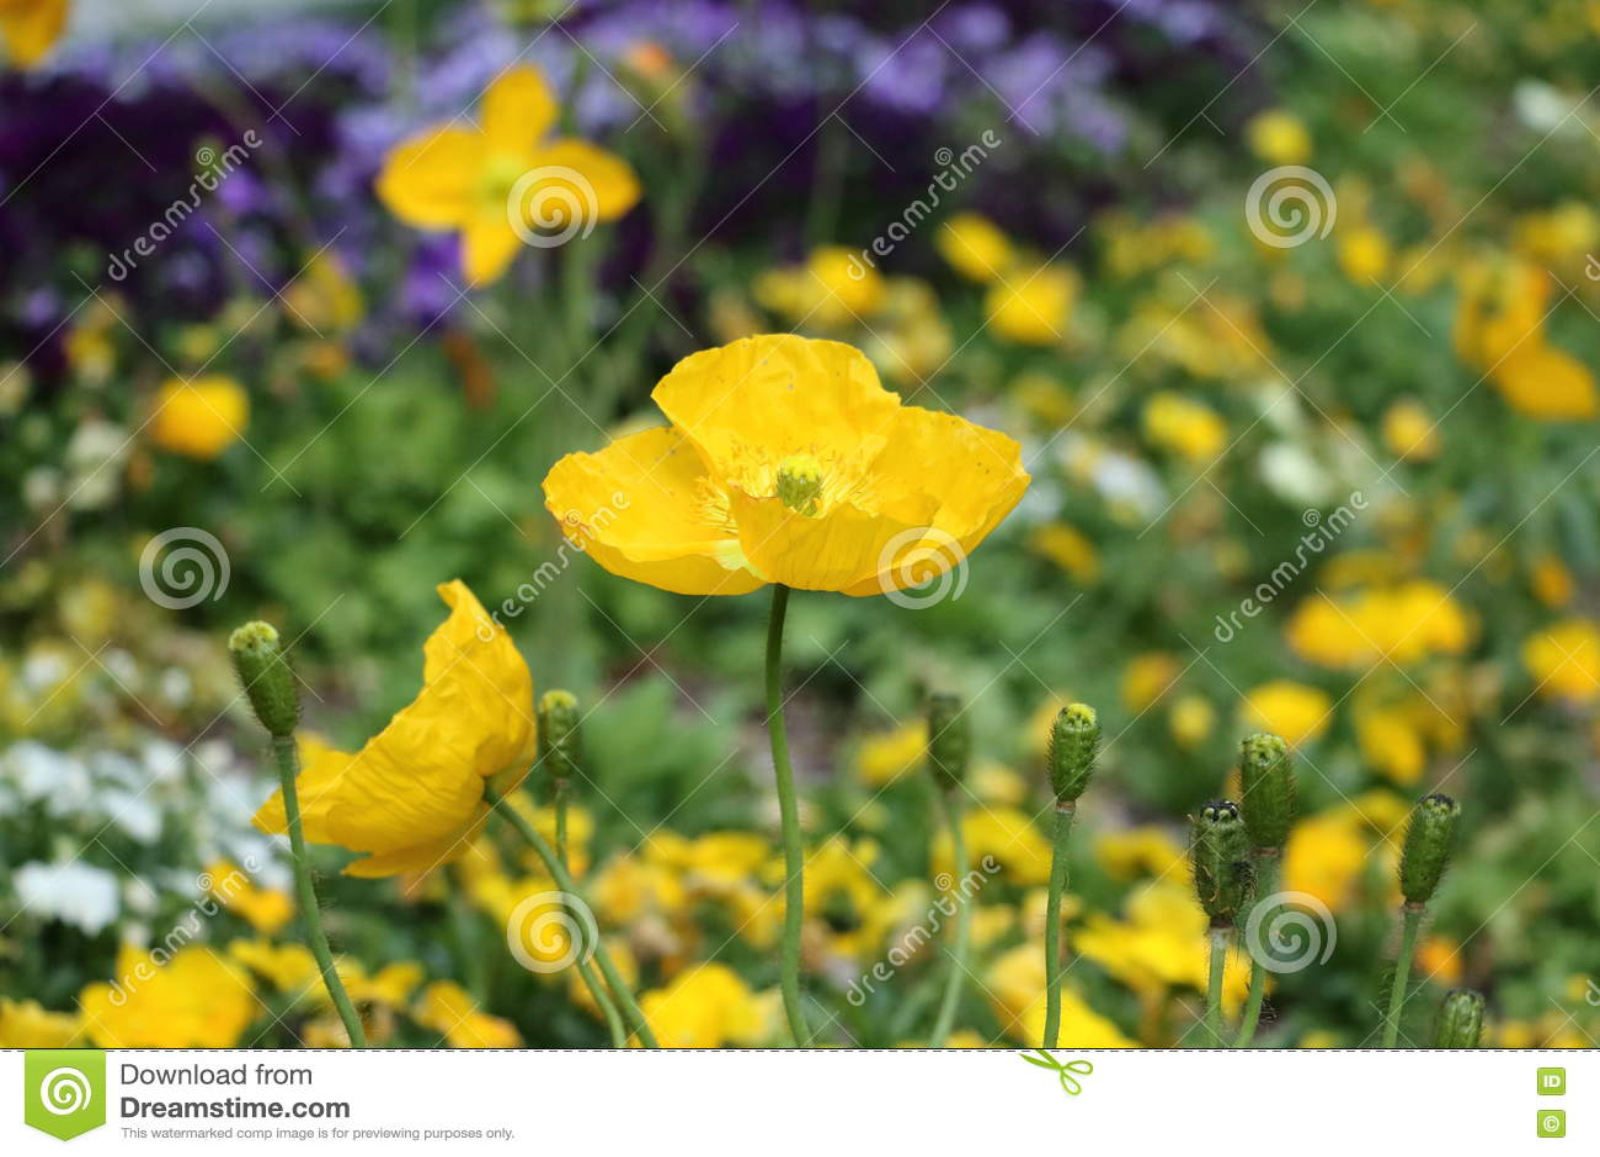 Yellow poppy flower stock image image of fields plant 72368315 download yellow poppy flower stock image image of fields plant 72368315 mightylinksfo